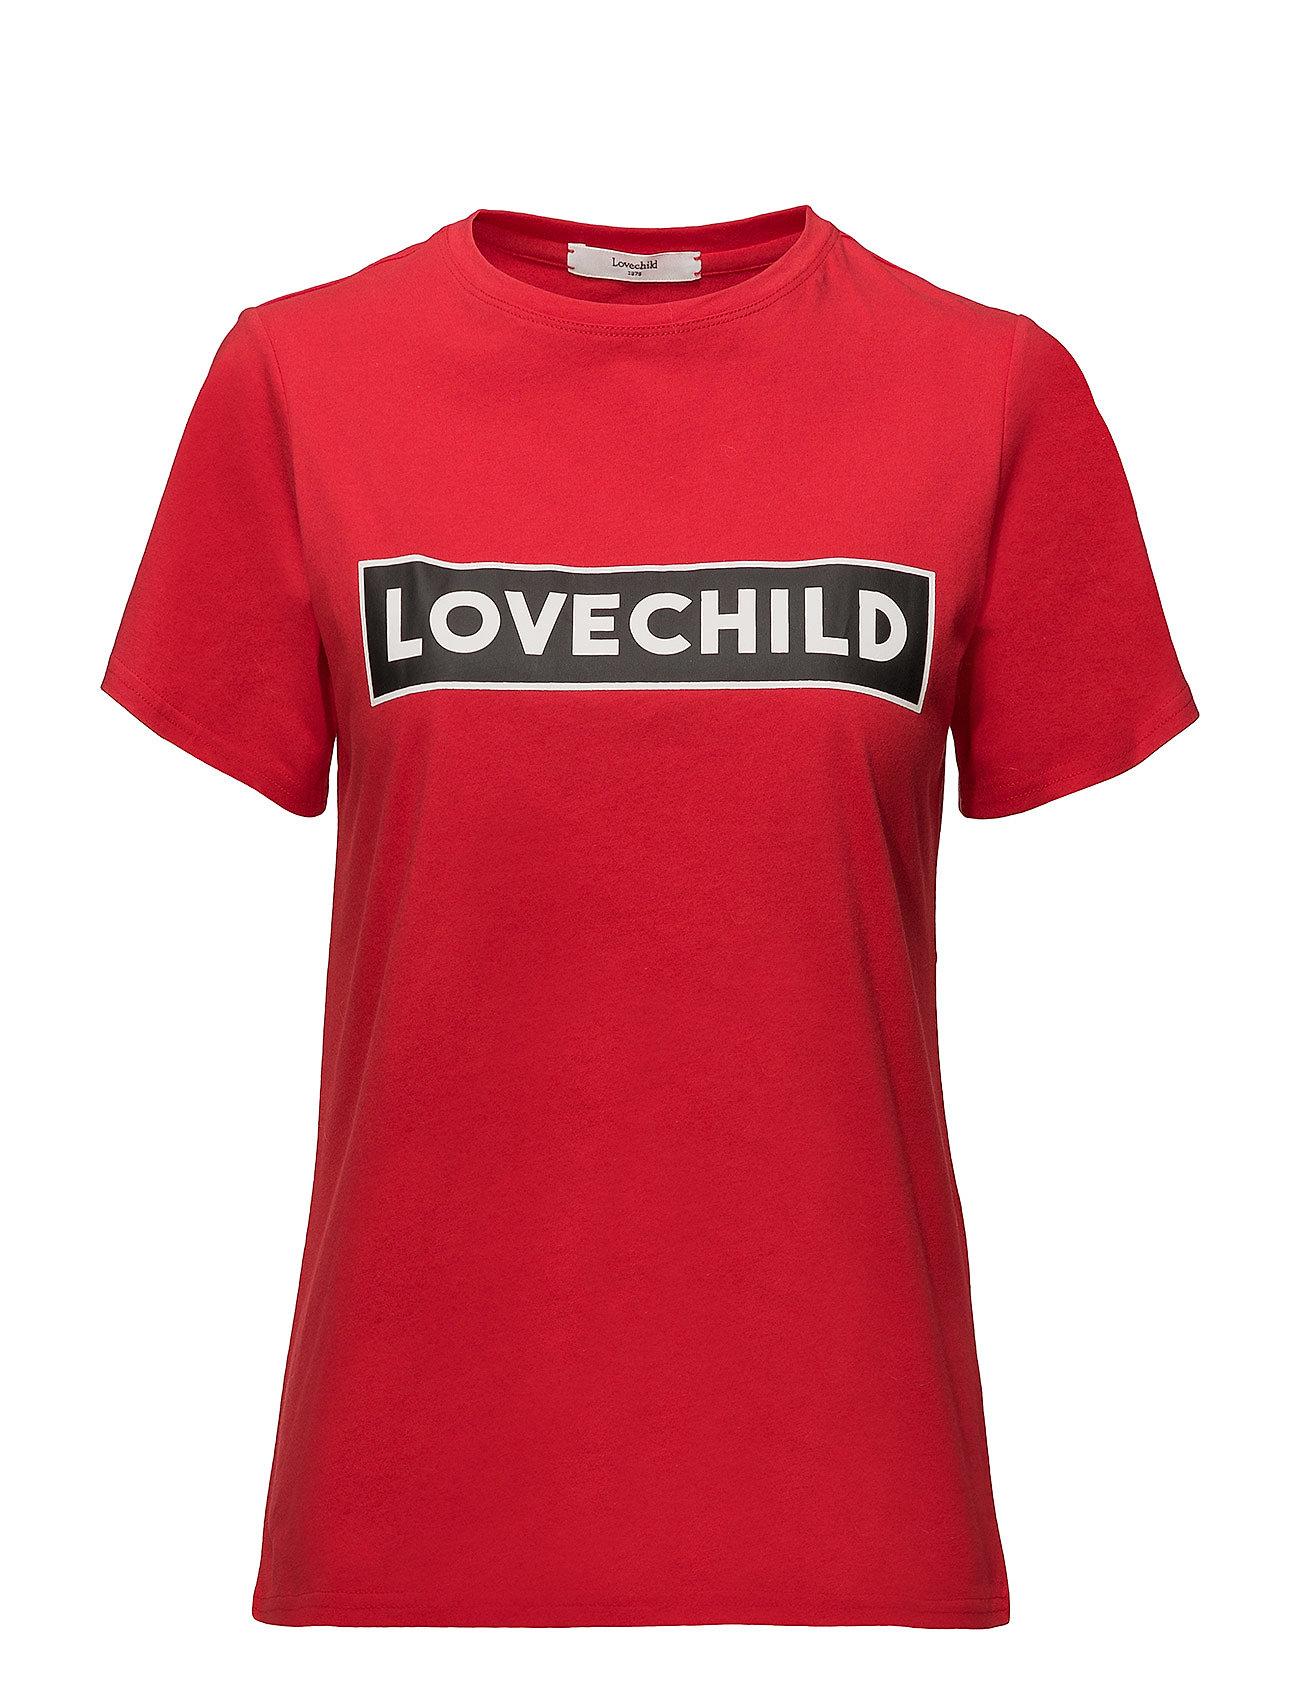 Lovechild 1979 Alyssa T-Shirt